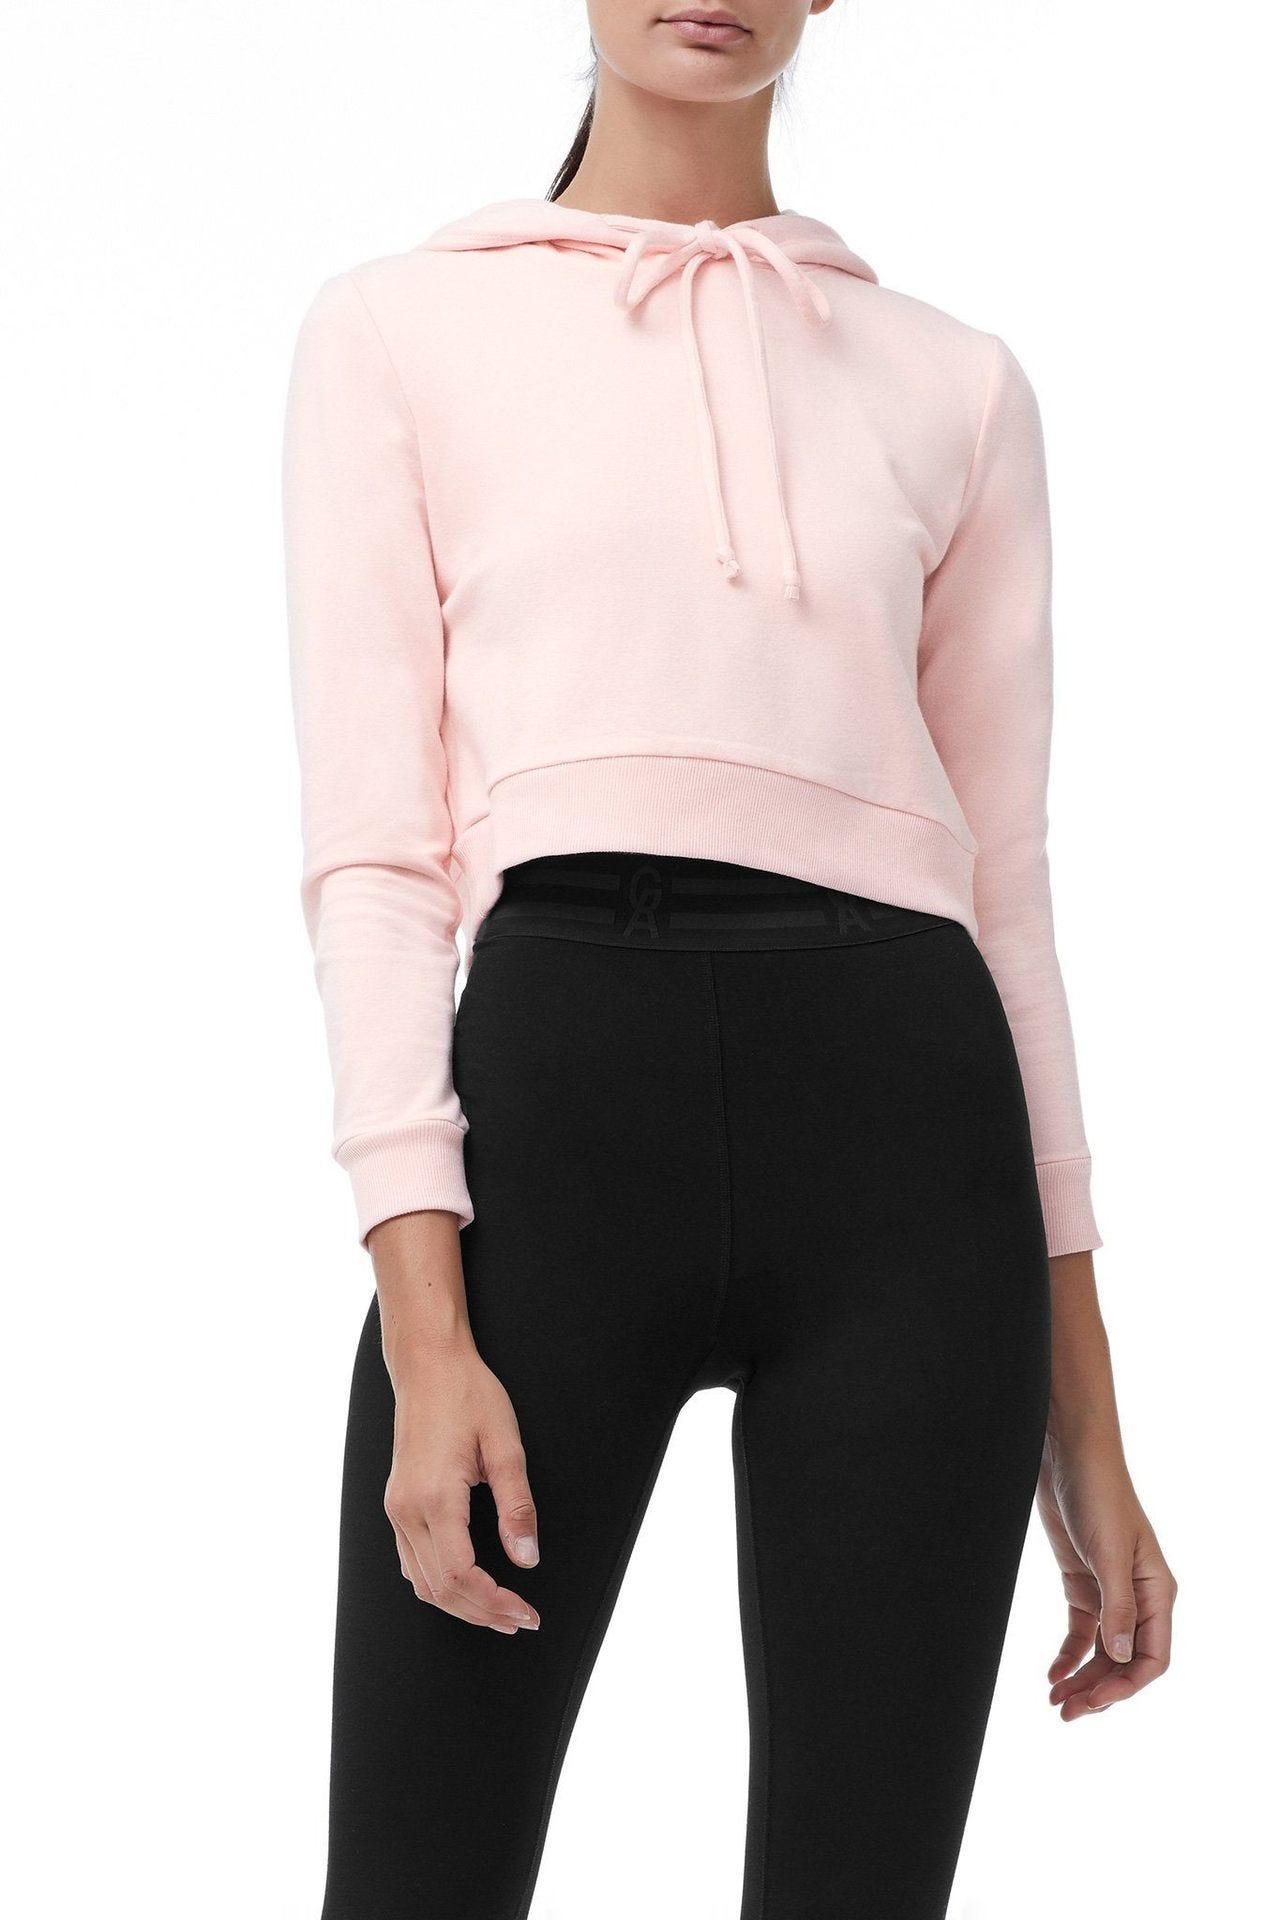 fabe06f86 Khloe Kardashian Good American Launches Activewear Line